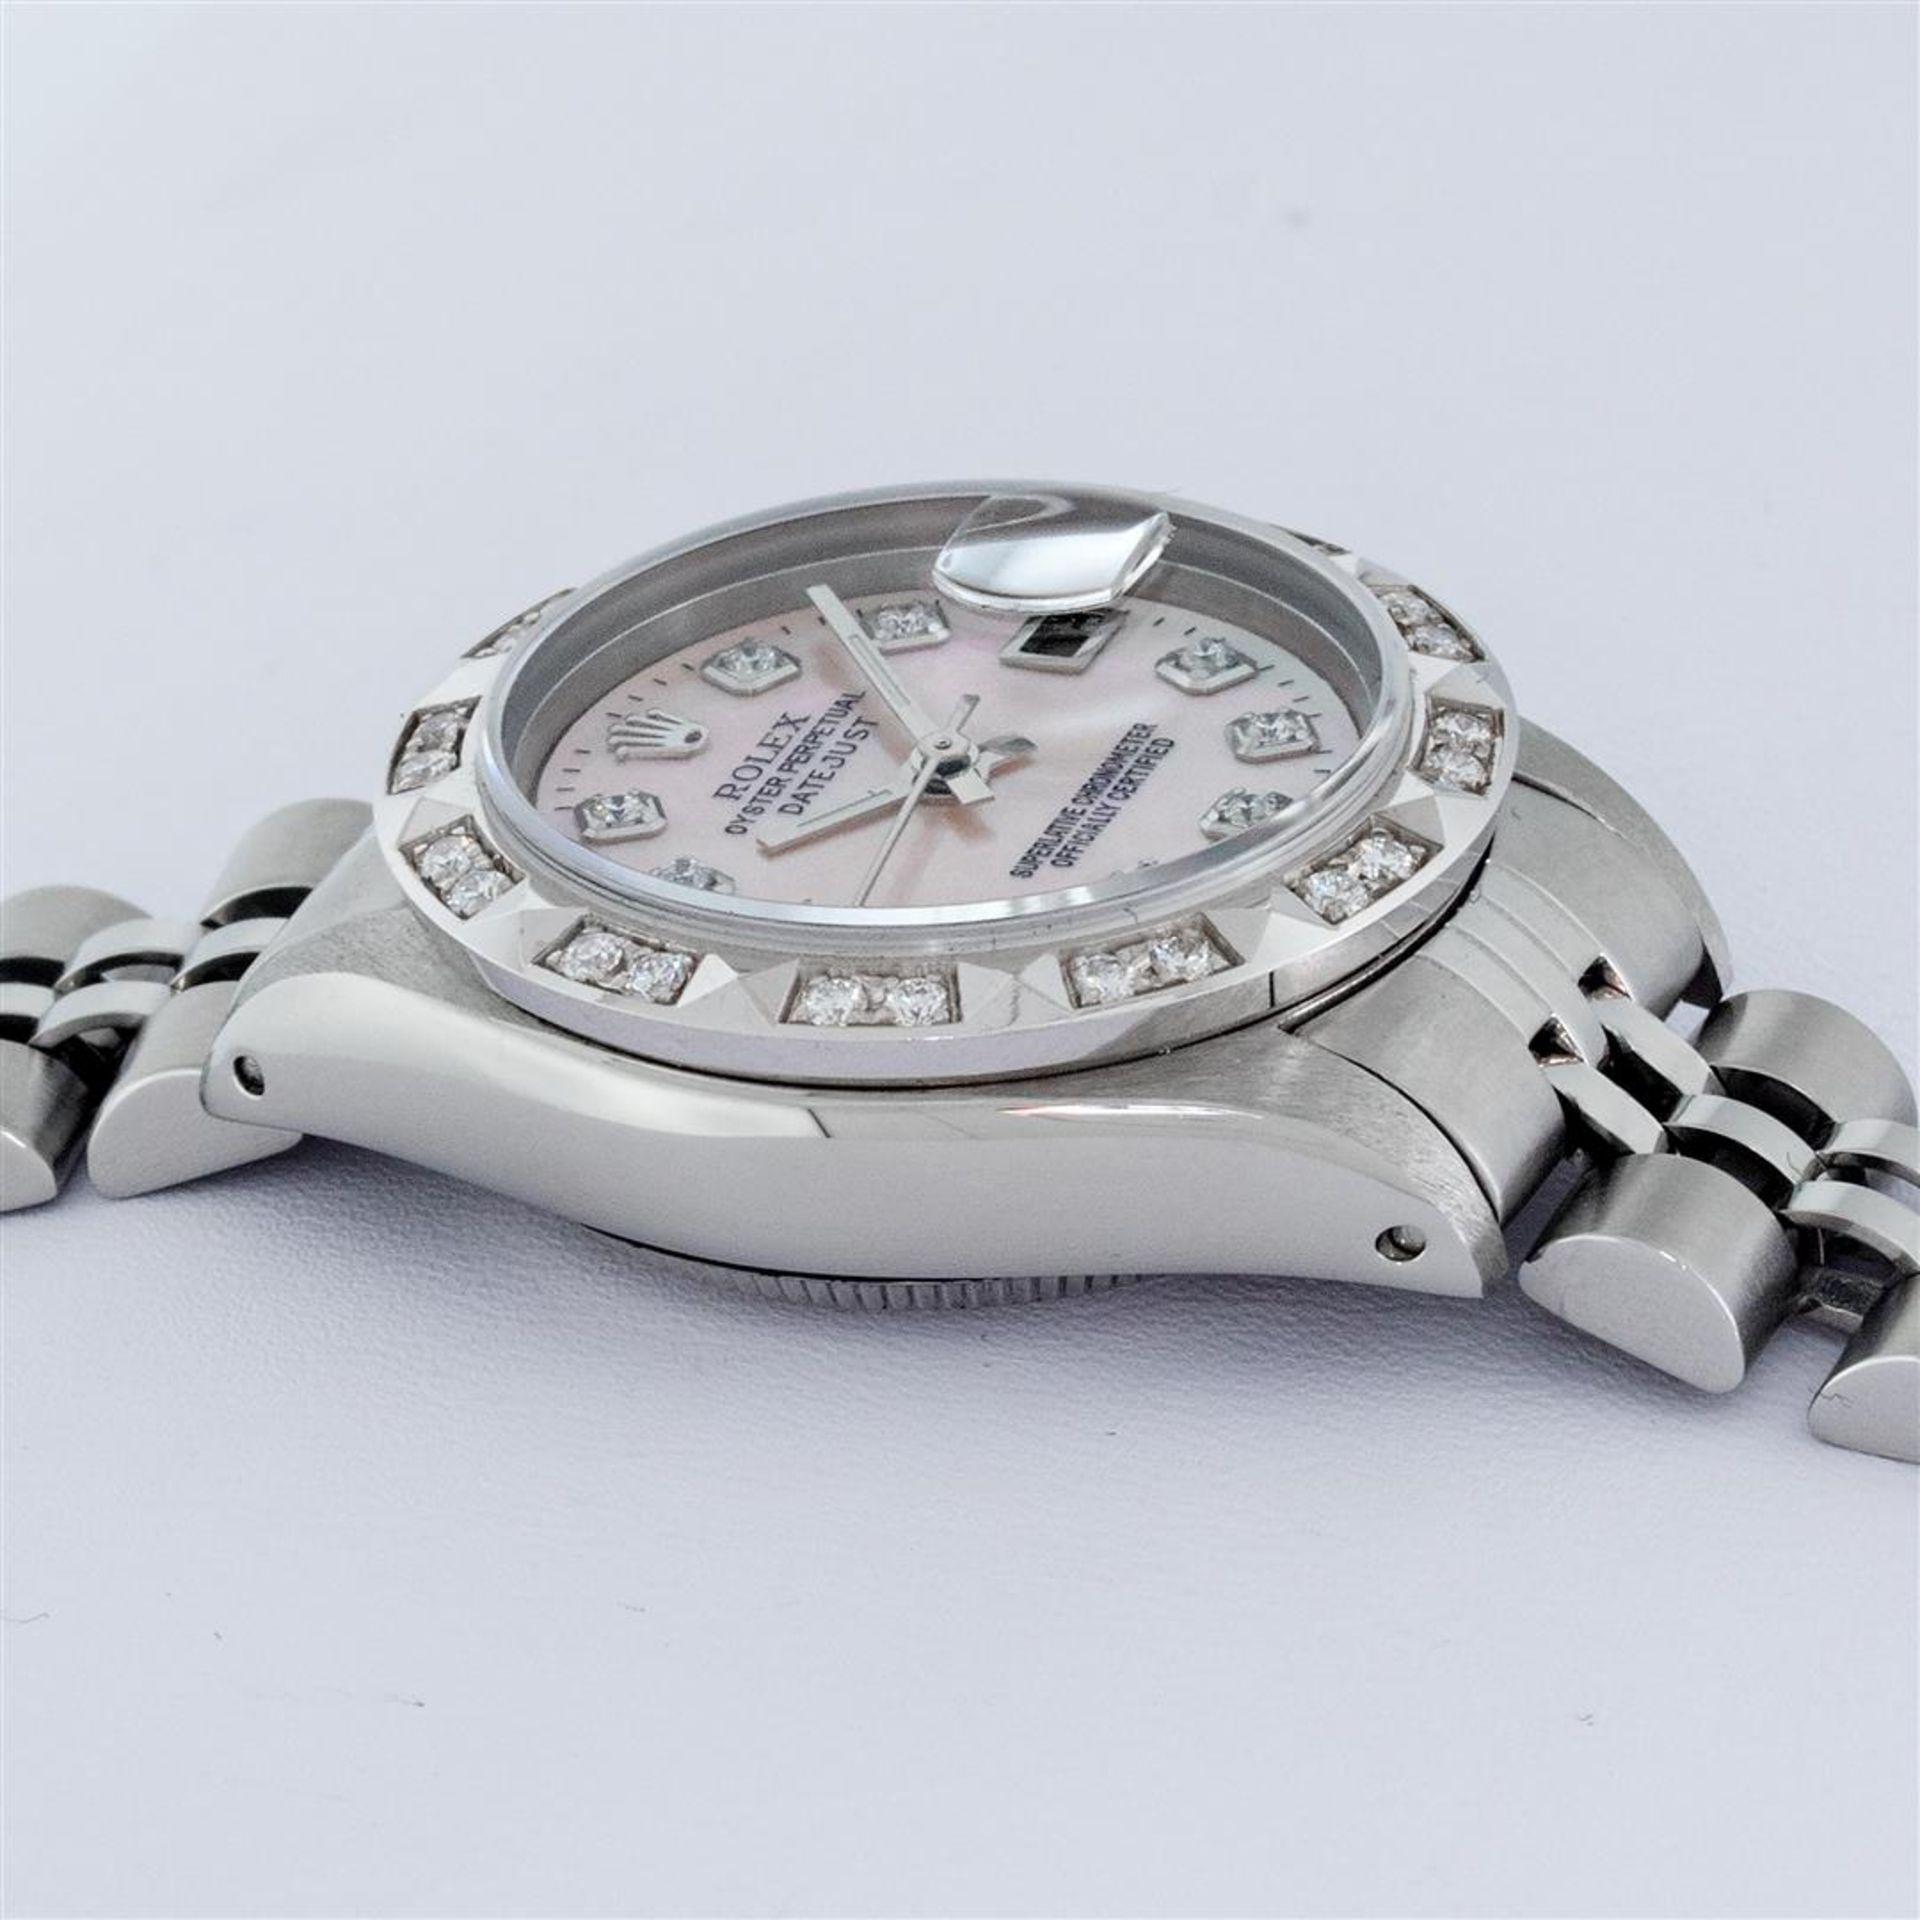 Rolex Ladies Stainless Steel Pink MOP Pyramid Diamond Datejust Wristwatch 26MM - Image 6 of 9